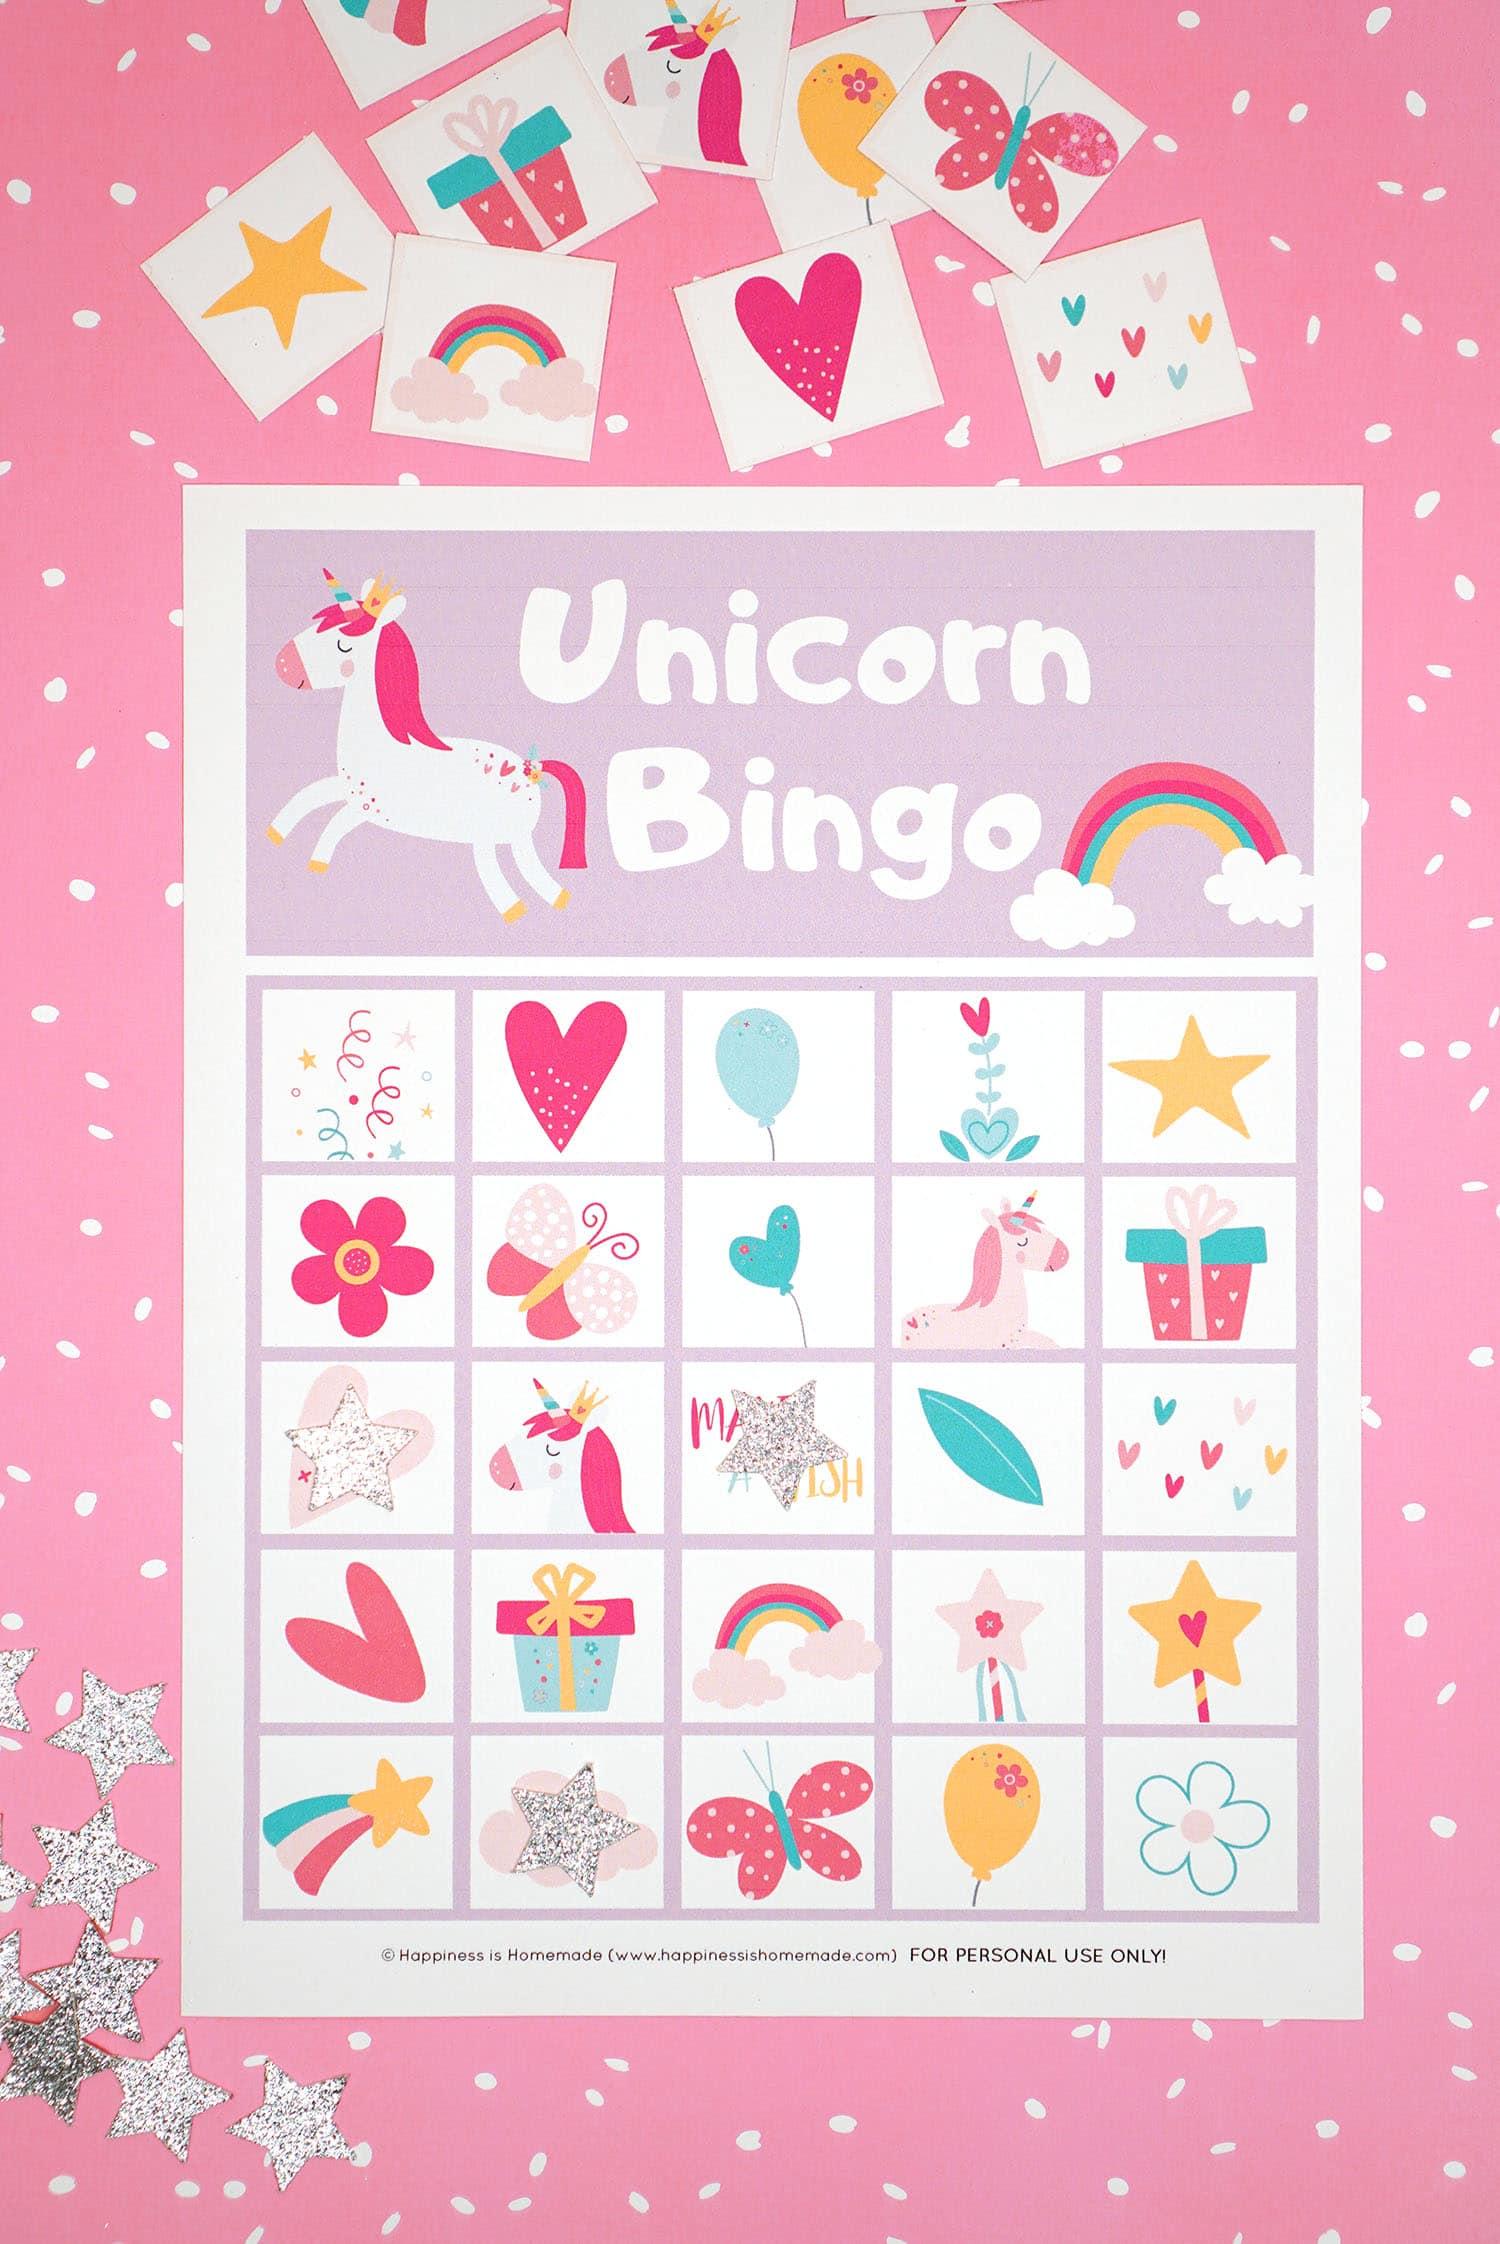 Collection Everyday People BINGO Card Patterns for Really Fun BINGO Games Bingo Cards